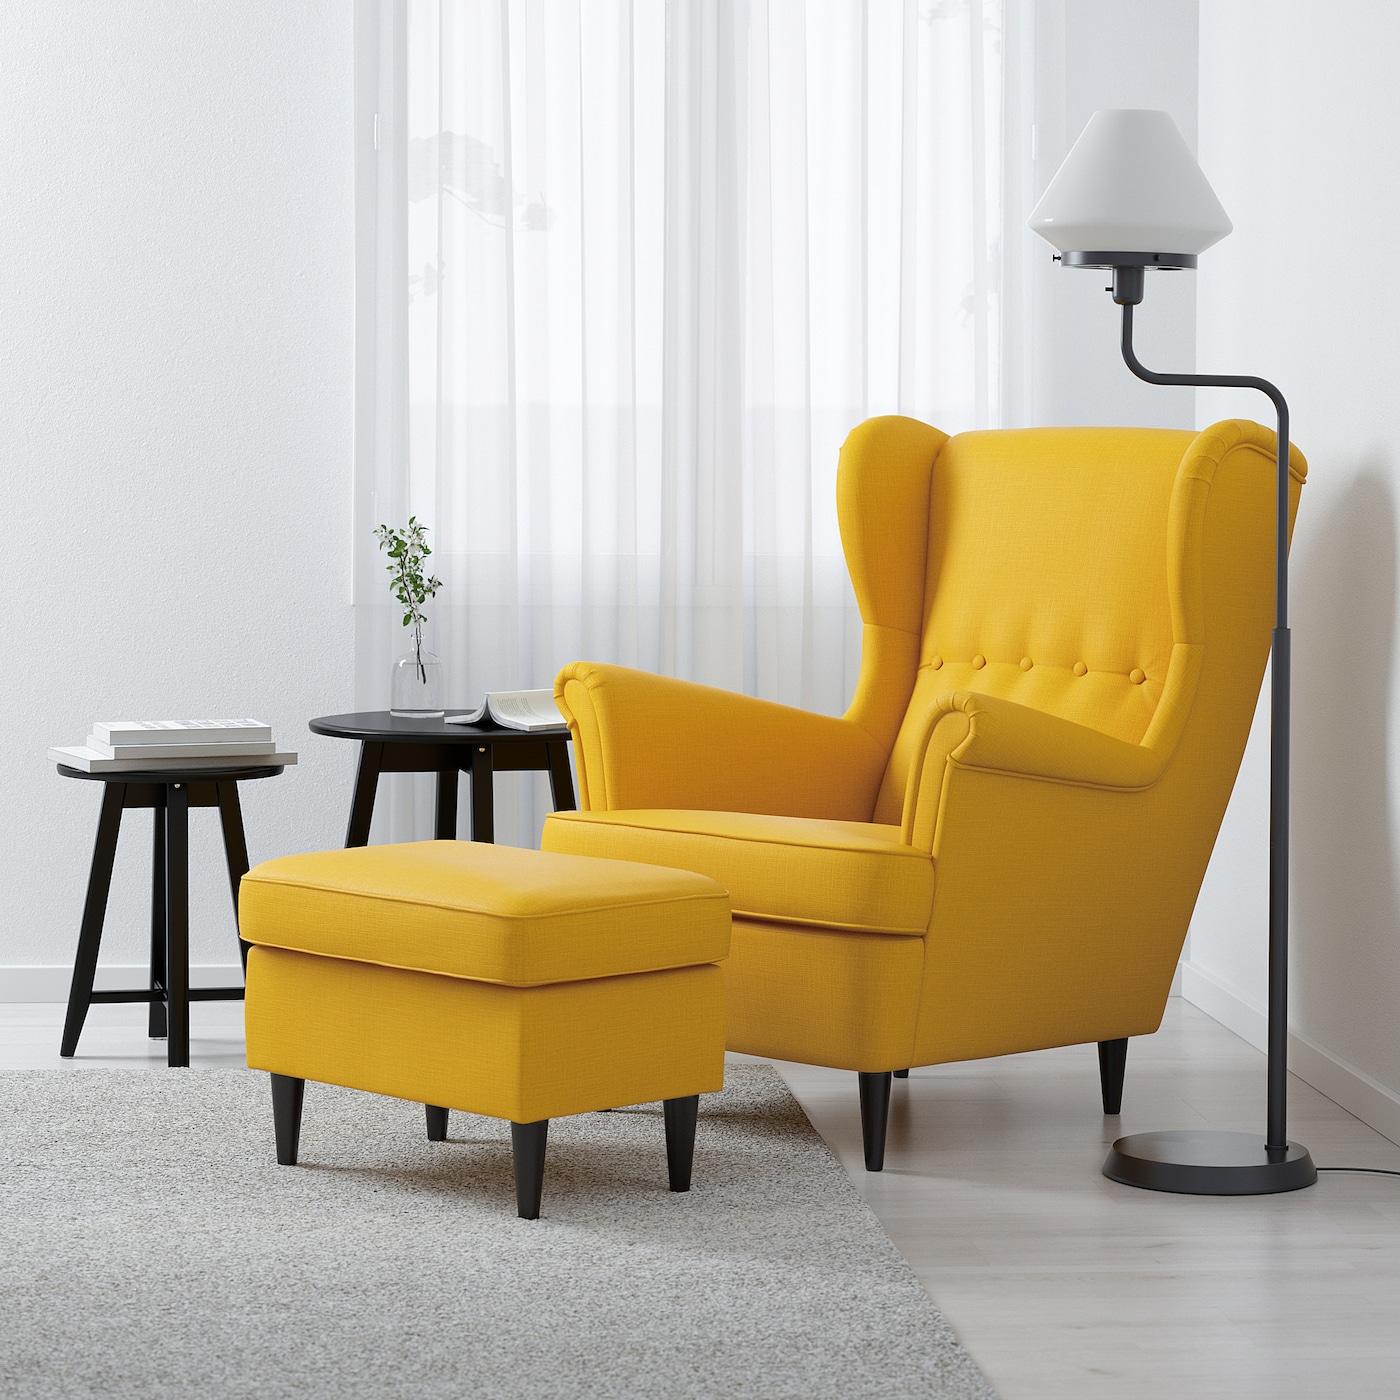 "STRANDMON wing chair Skiftebo yellow 32 1/4 "" 37 3/4 "" 39 3/4 "" 19 1/4 "" 21 1/4 "" 17 3/4 """